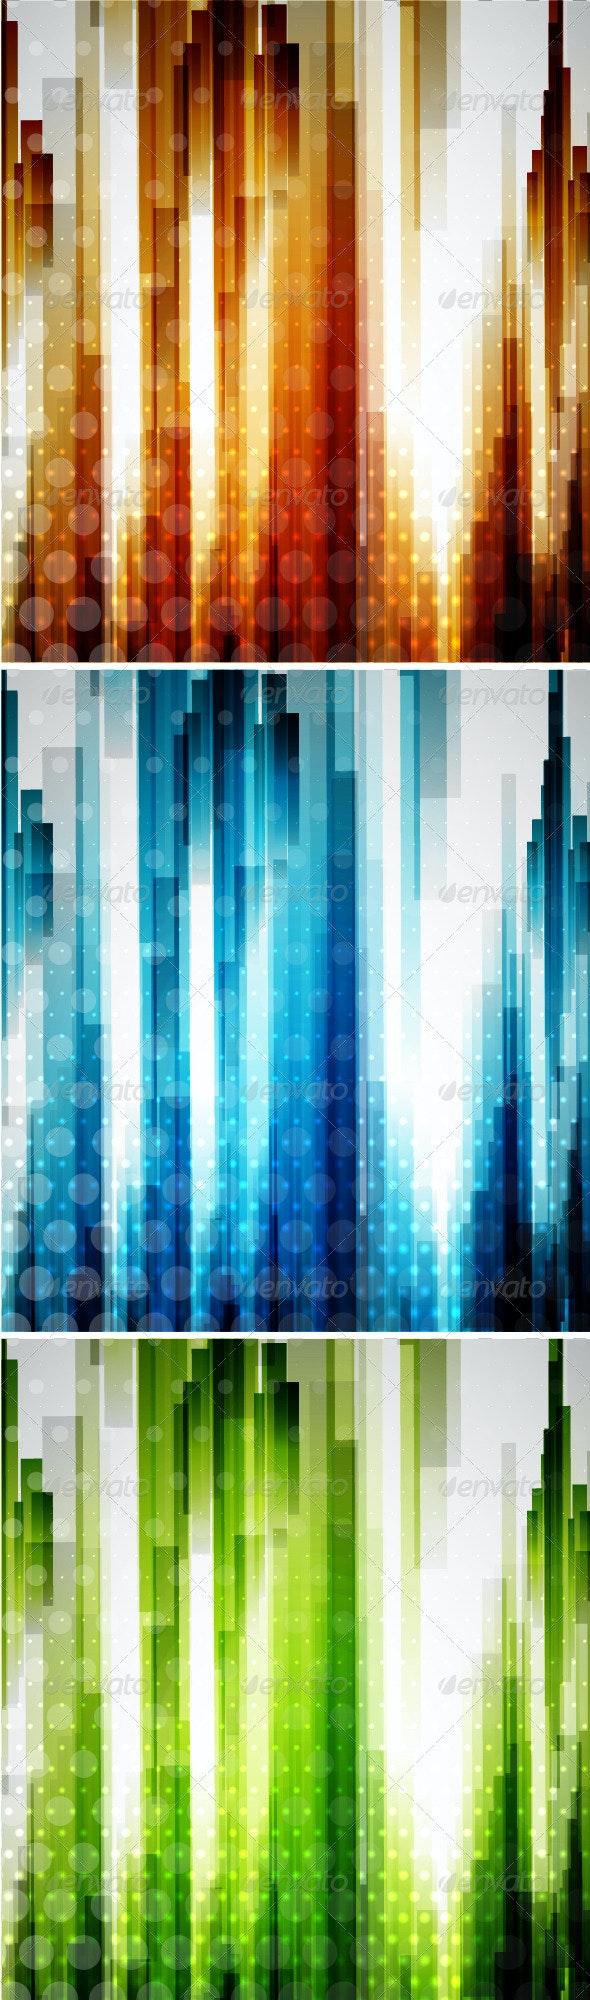 Vector Vertical Lines Backgrounds - Backgrounds Decorative